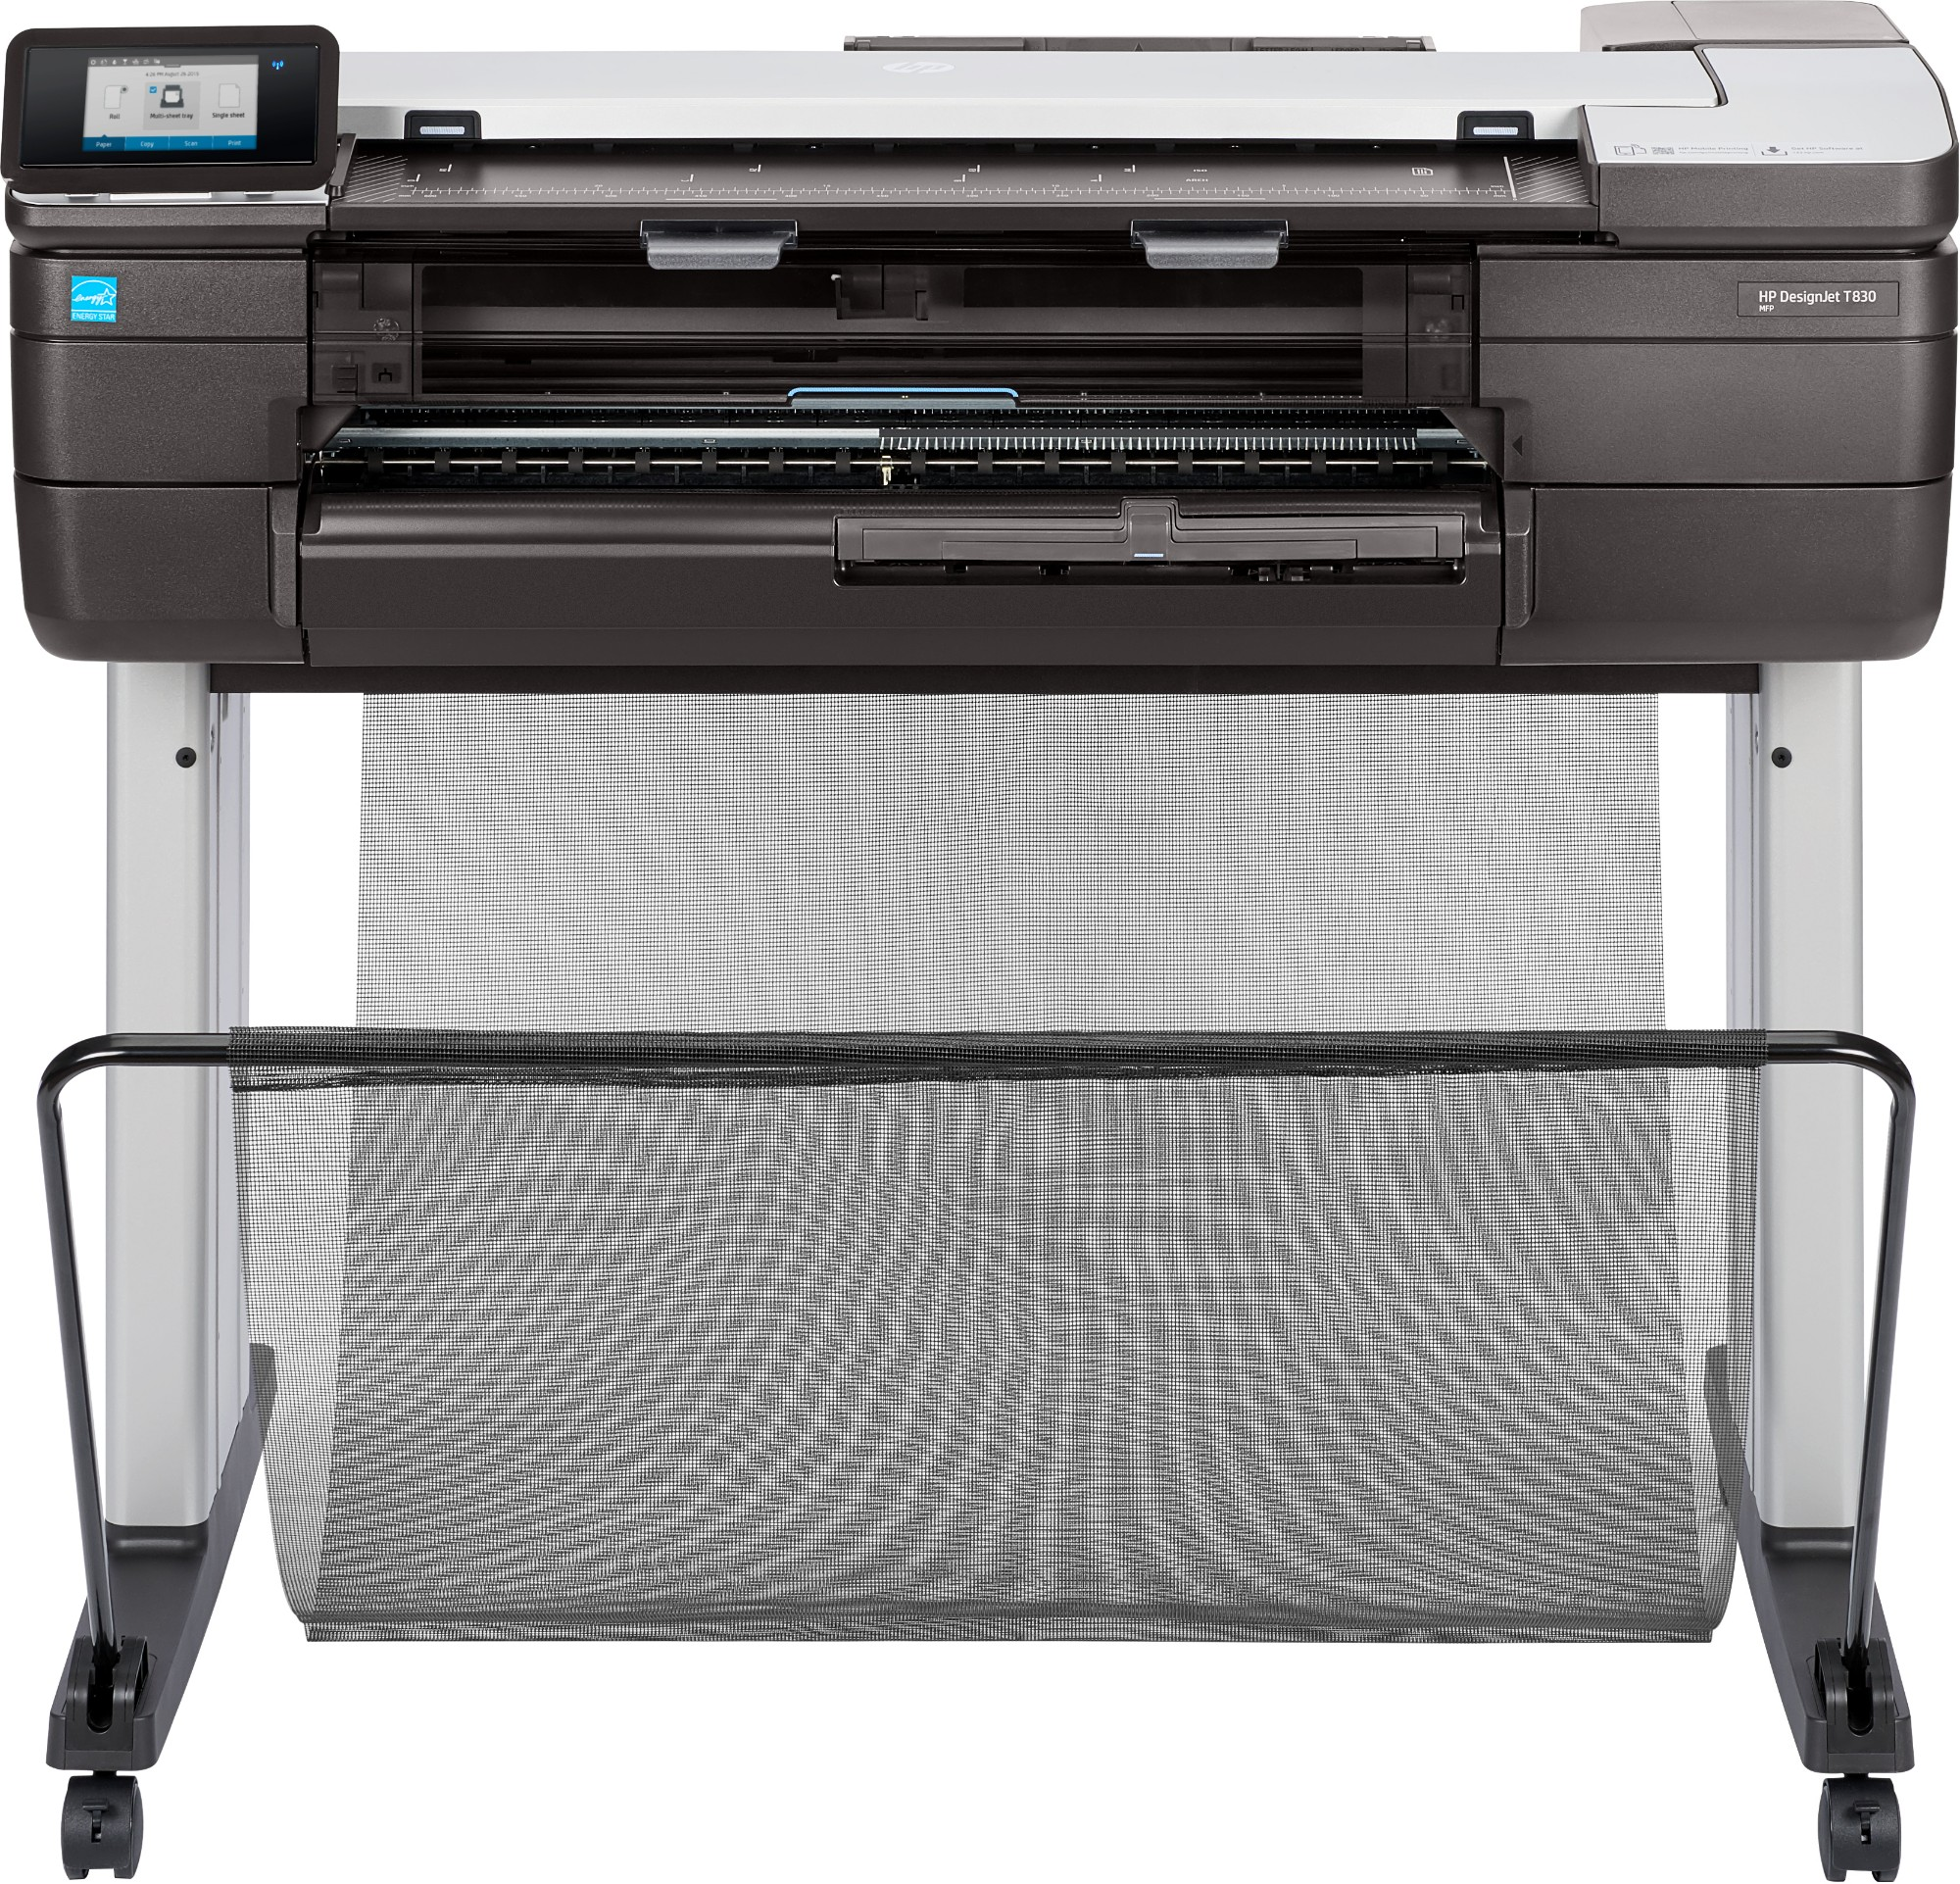 HP Designjet T830 24-in large format printer Inkjet Colour 2400 x 1200 DPI Wi-Fi